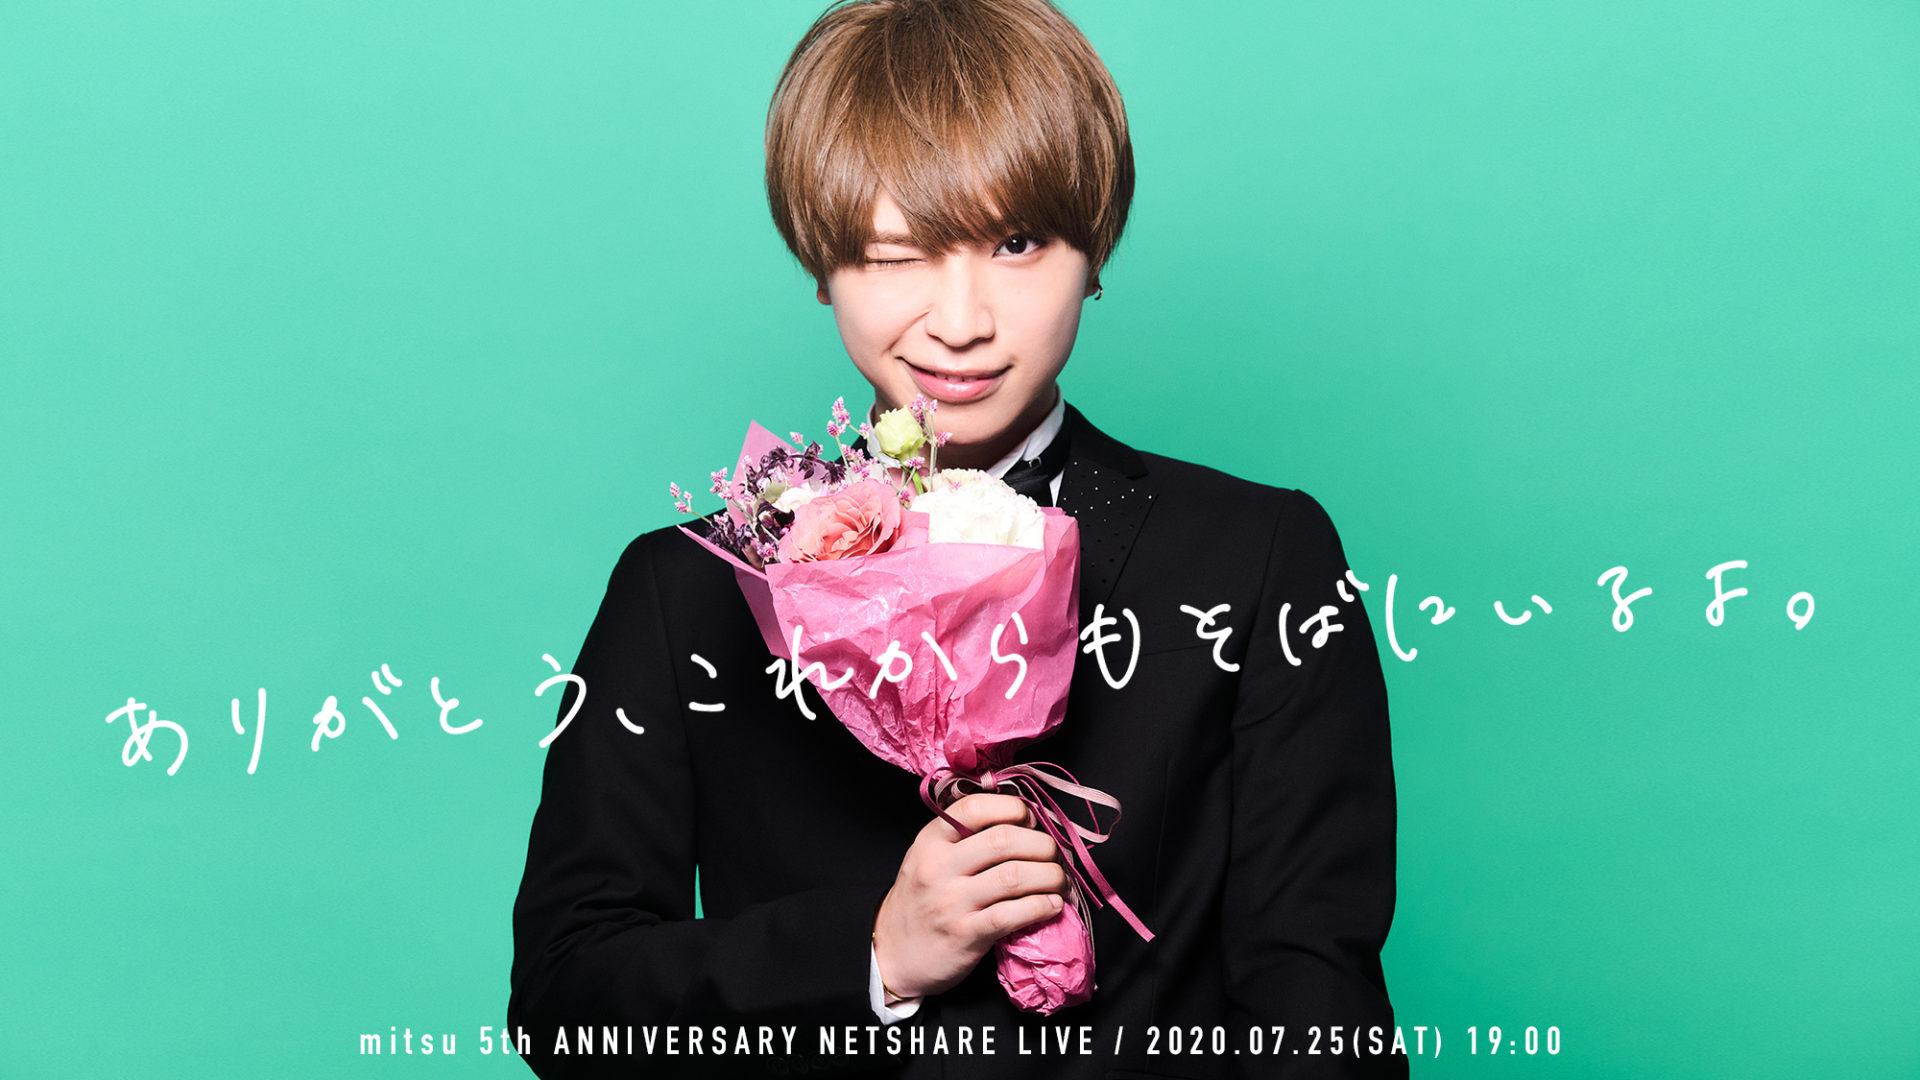 mitsu_5周年LIVE_FIX.jpg